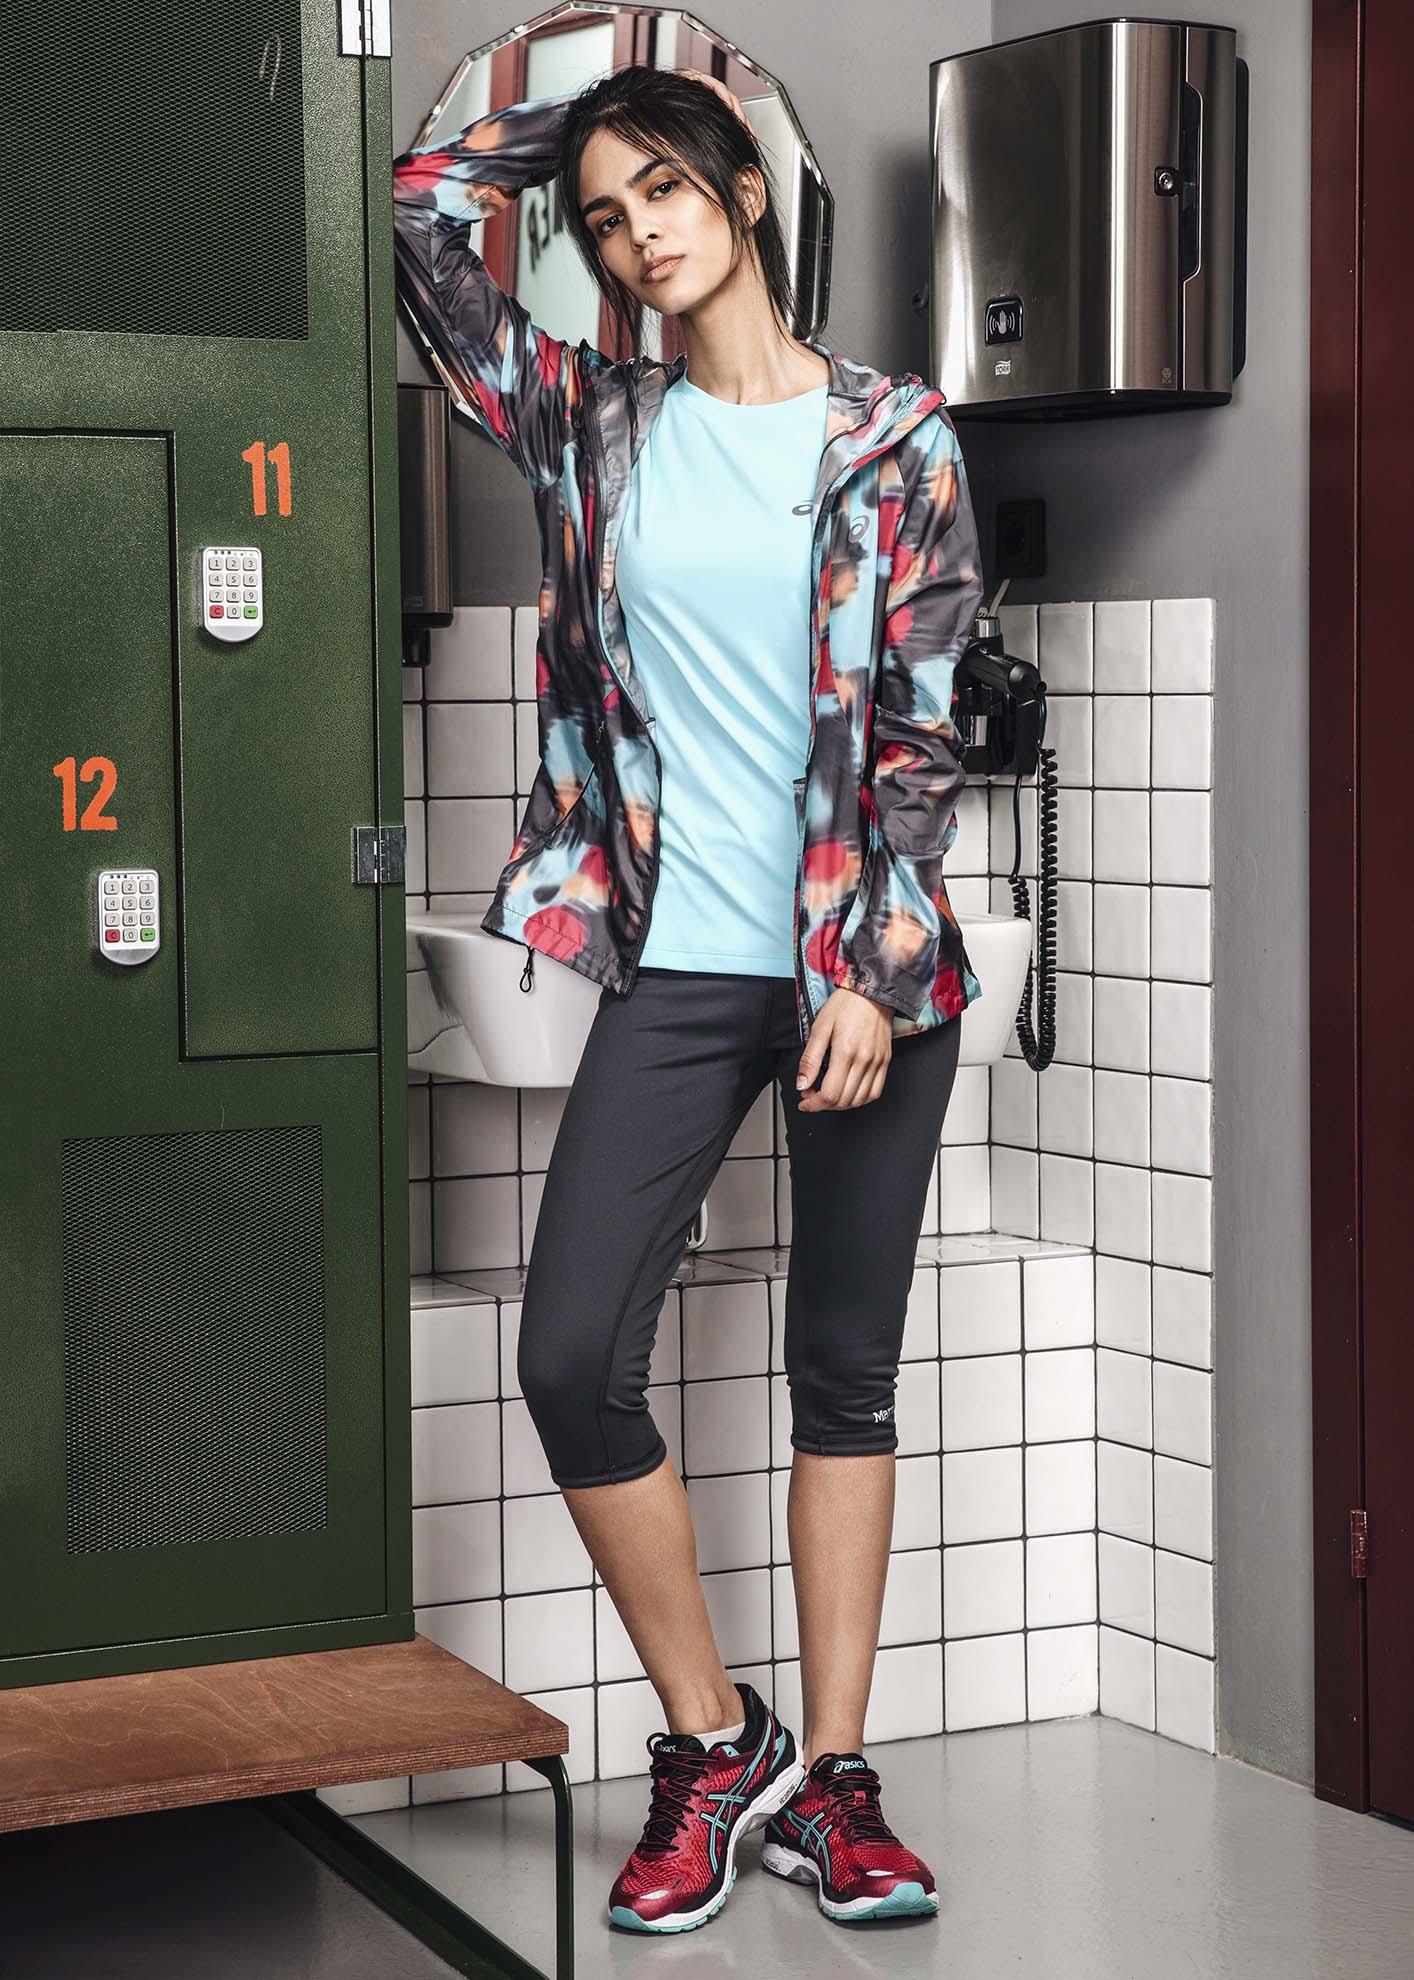 Galeria Advertising by Evgenia Voronova